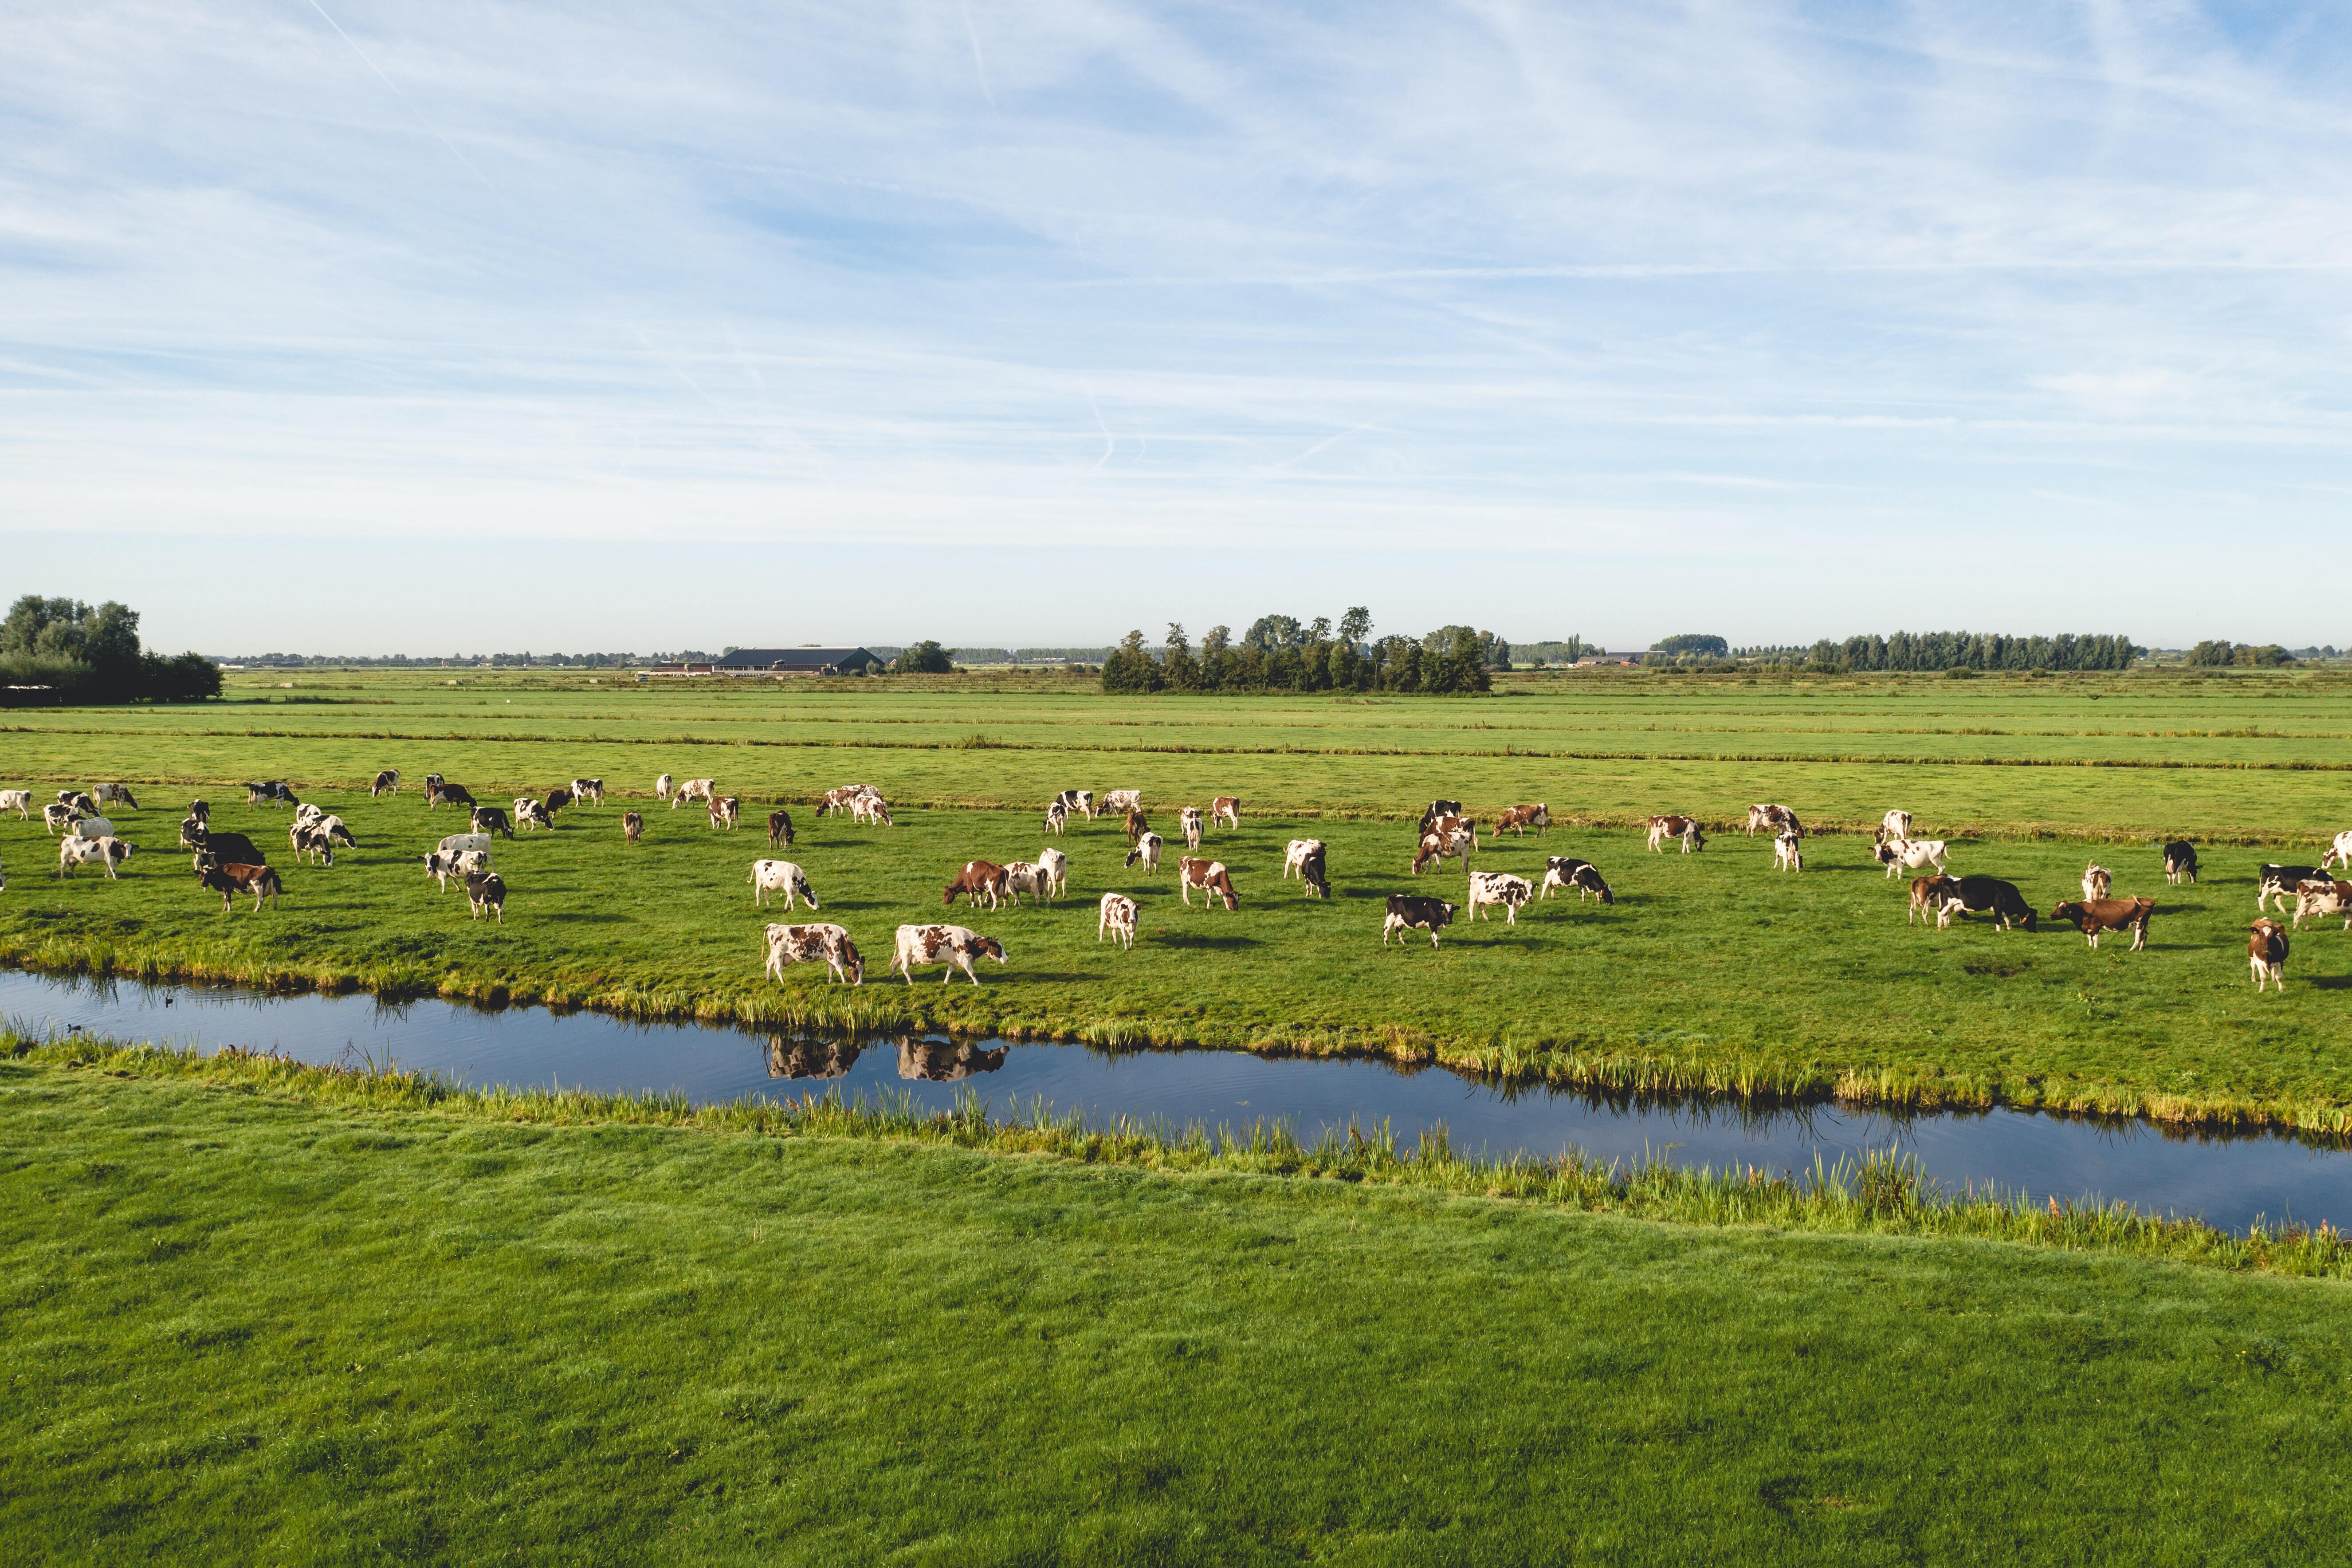 Levensproductie Nederlandse veestapel